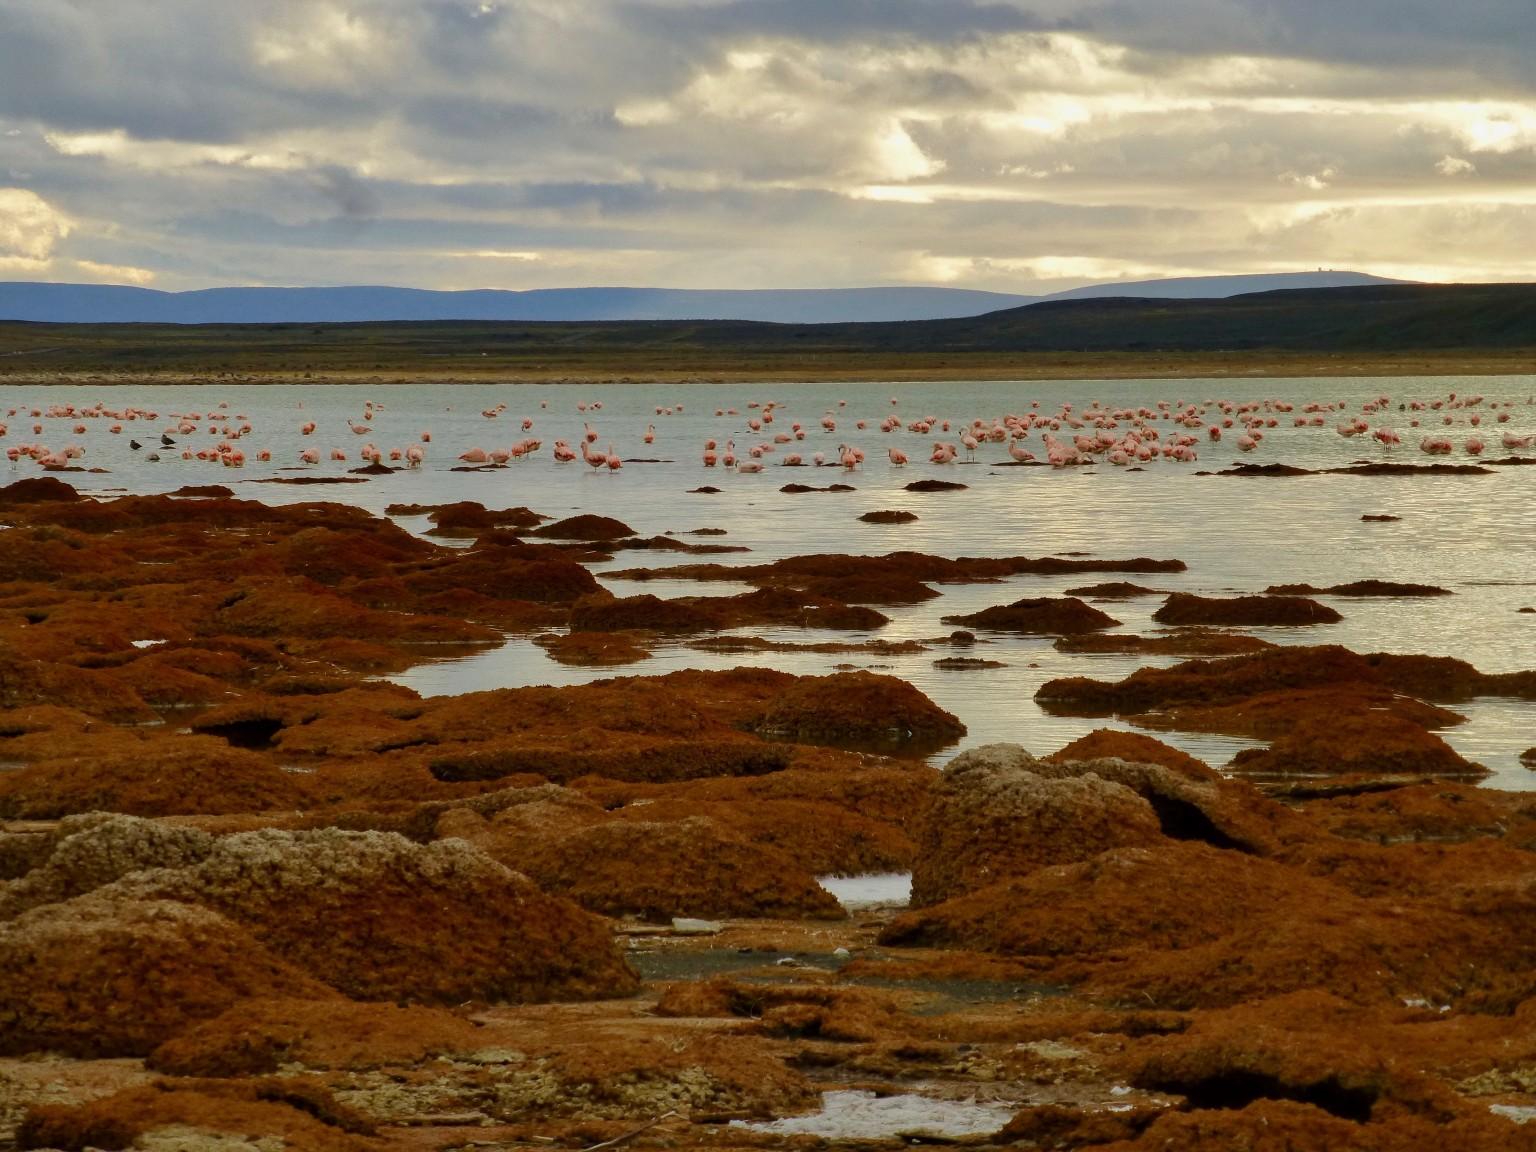 TDF-Orange-Rocks-And-Flamingos-6-23-20